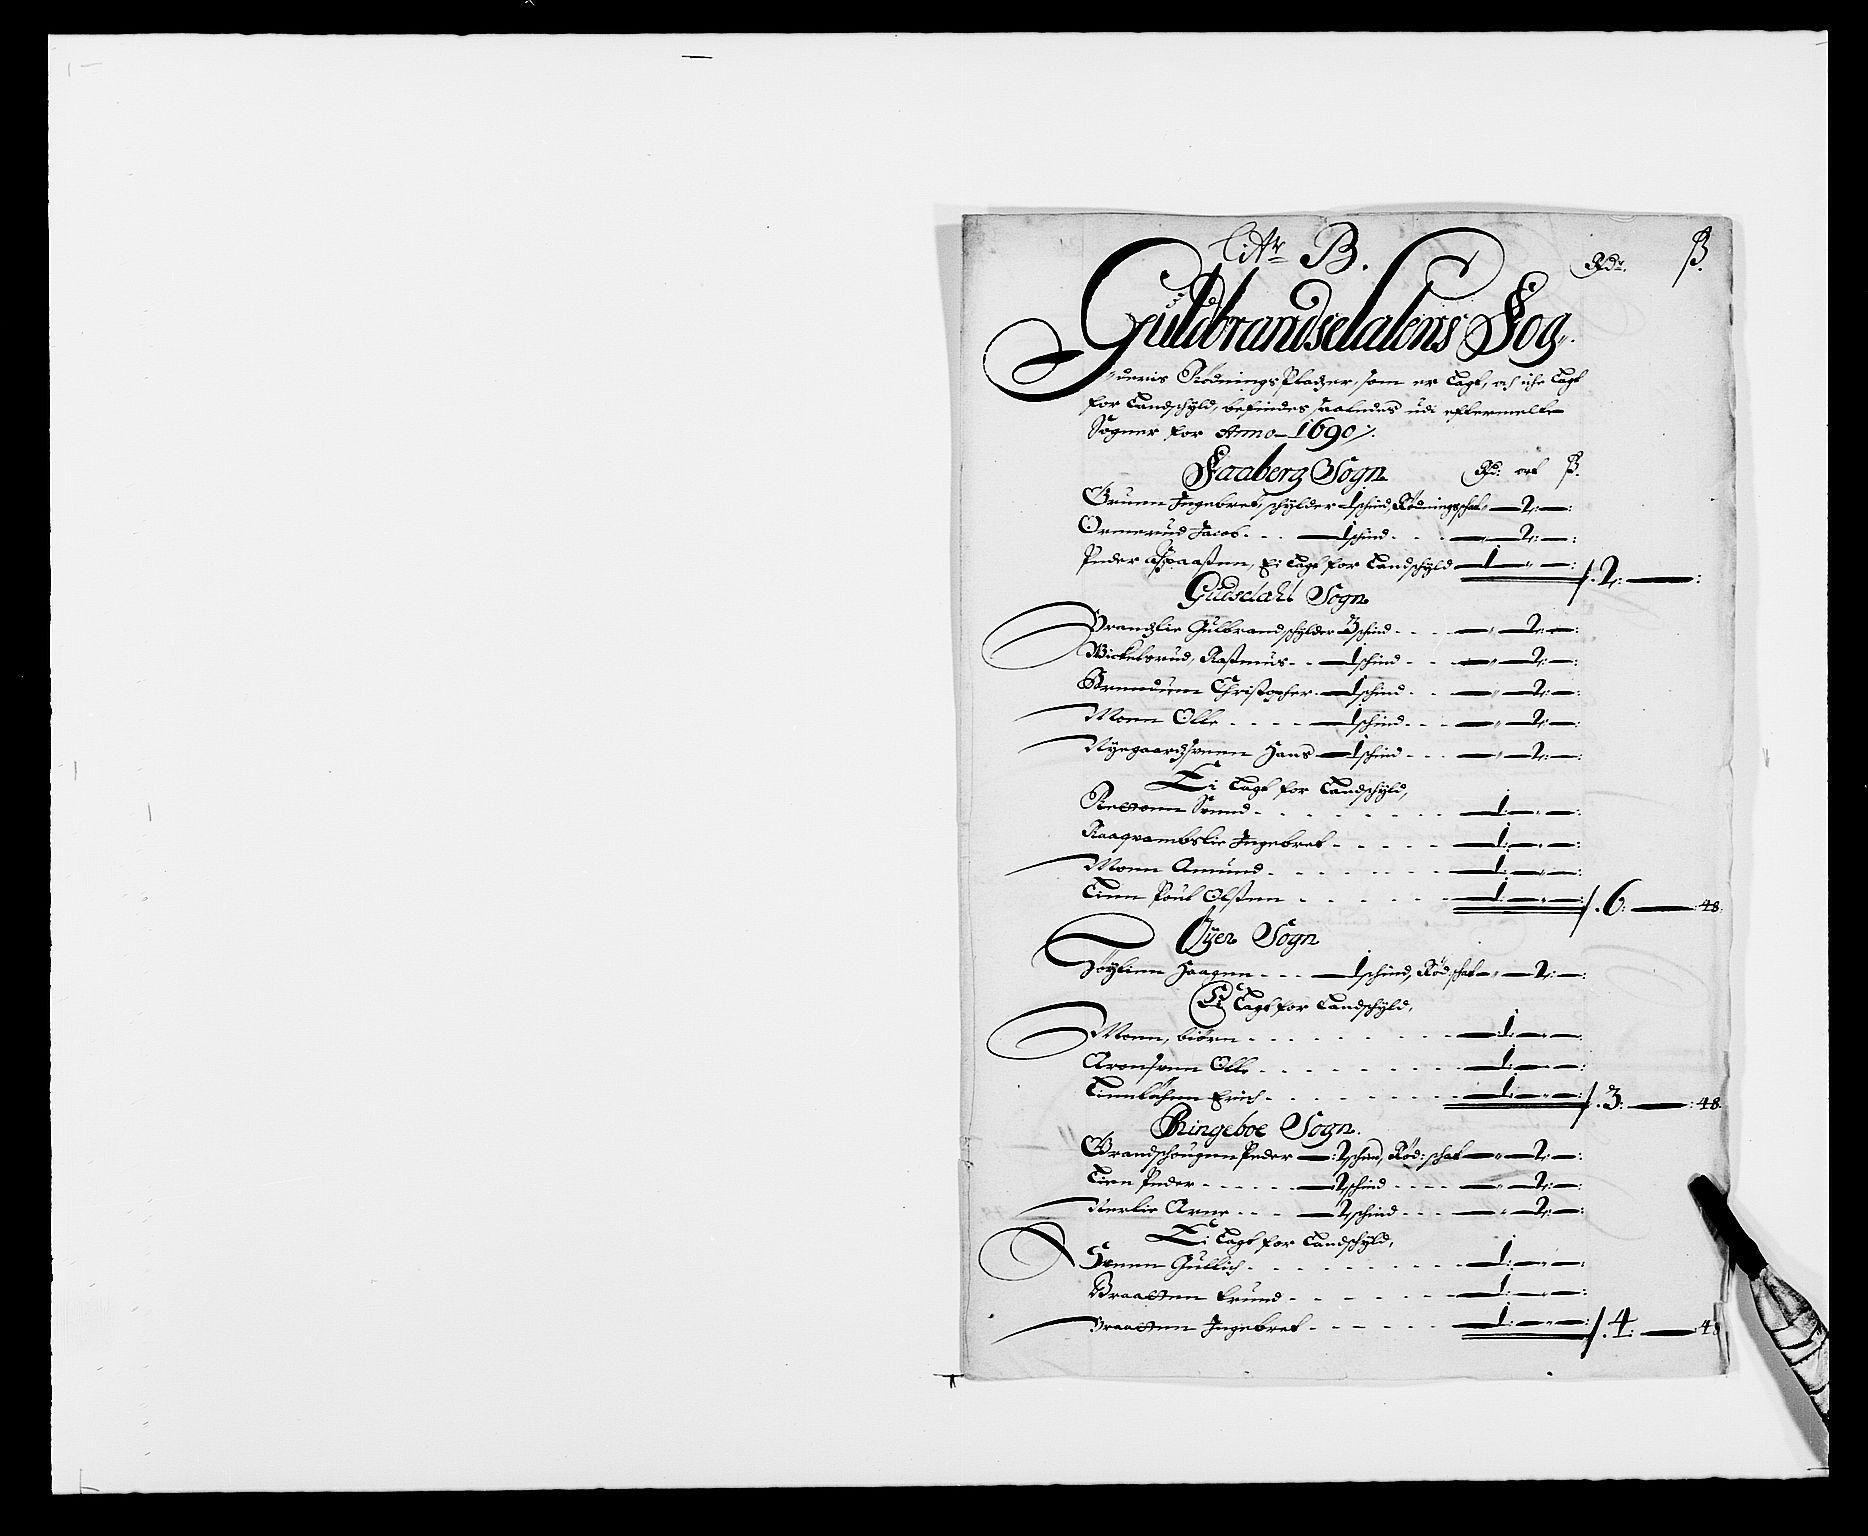 RA, Rentekammeret inntil 1814, Reviderte regnskaper, Fogderegnskap, R17/L1165: Fogderegnskap Gudbrandsdal, 1690-1692, s. 47